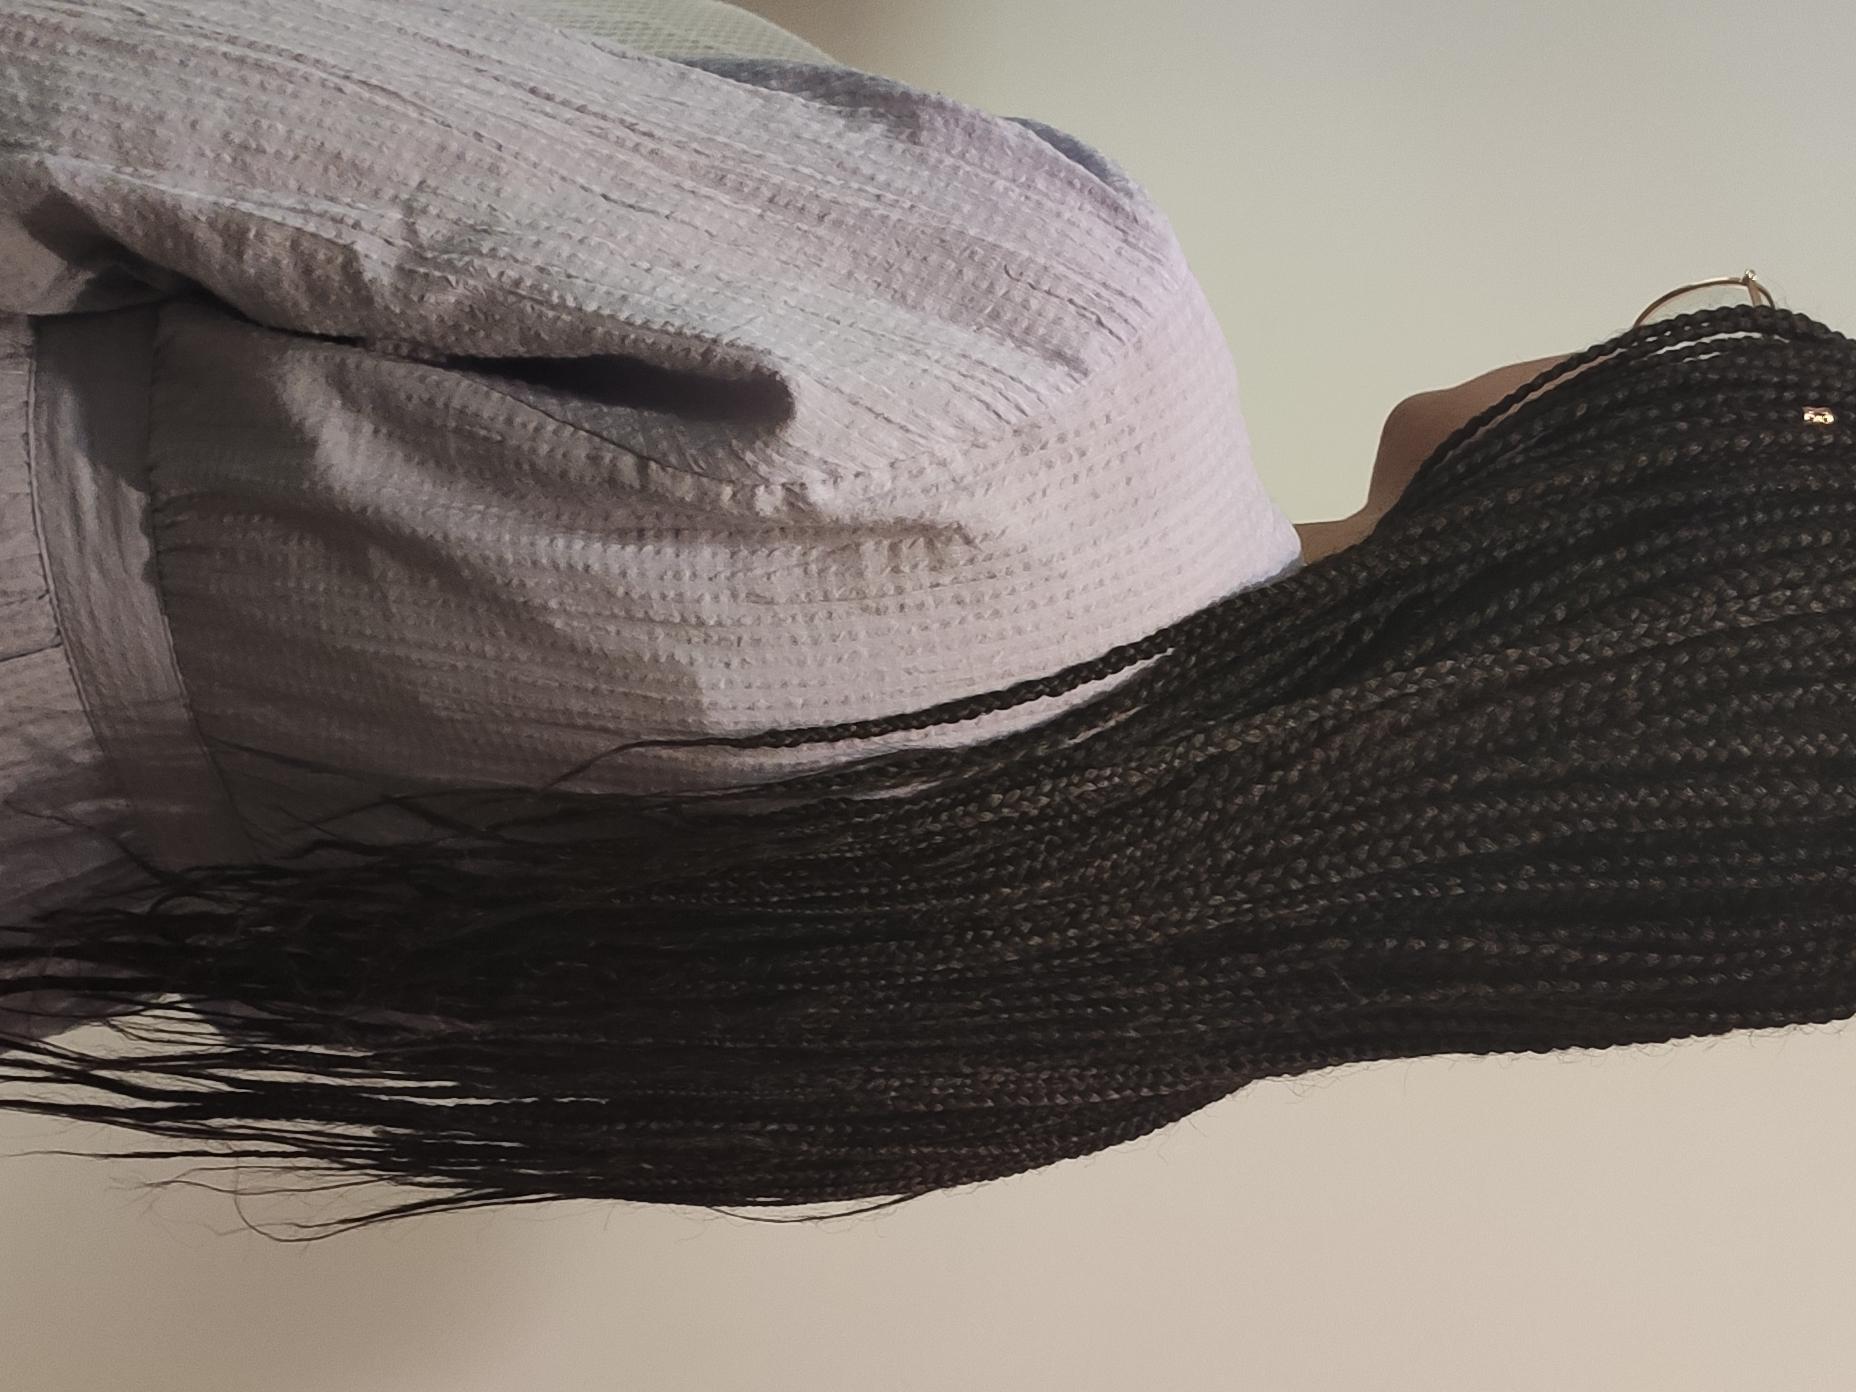 salon de coiffure afro tresse tresses box braids crochet braids vanilles tissages paris 75 77 78 91 92 93 94 95 OTAAVUYA